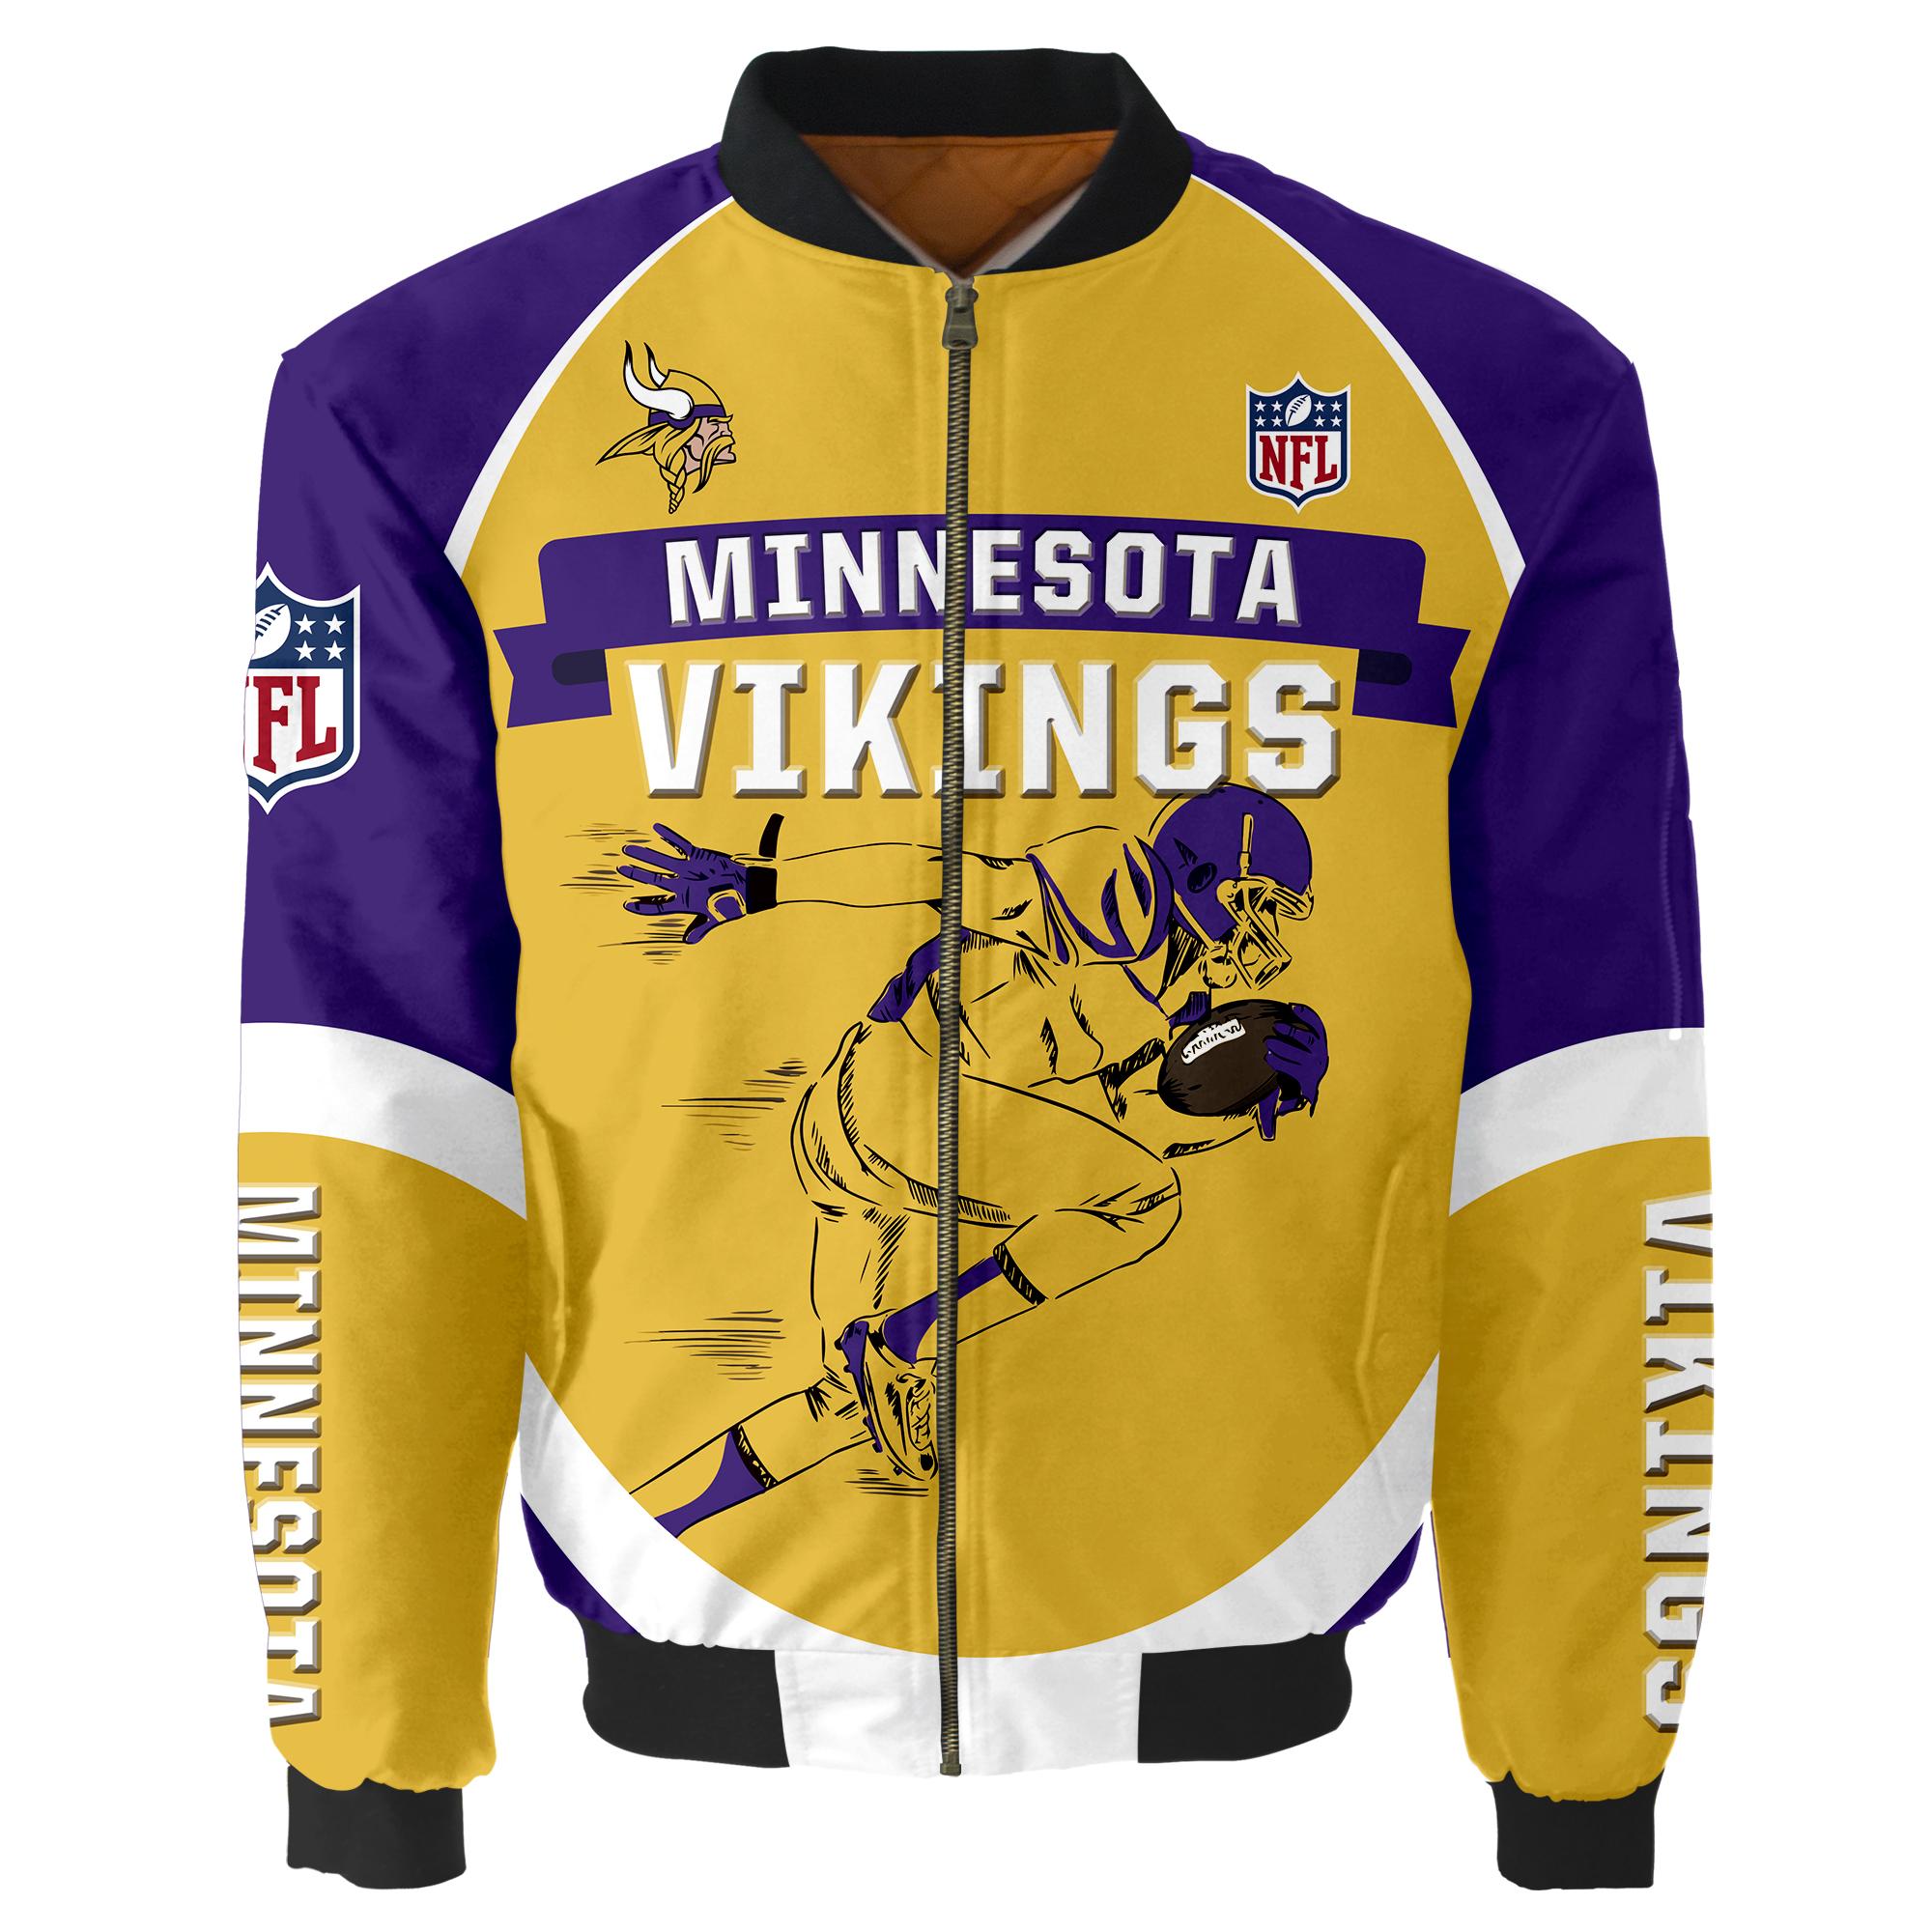 Minnesota Vikings Bomber Jacket